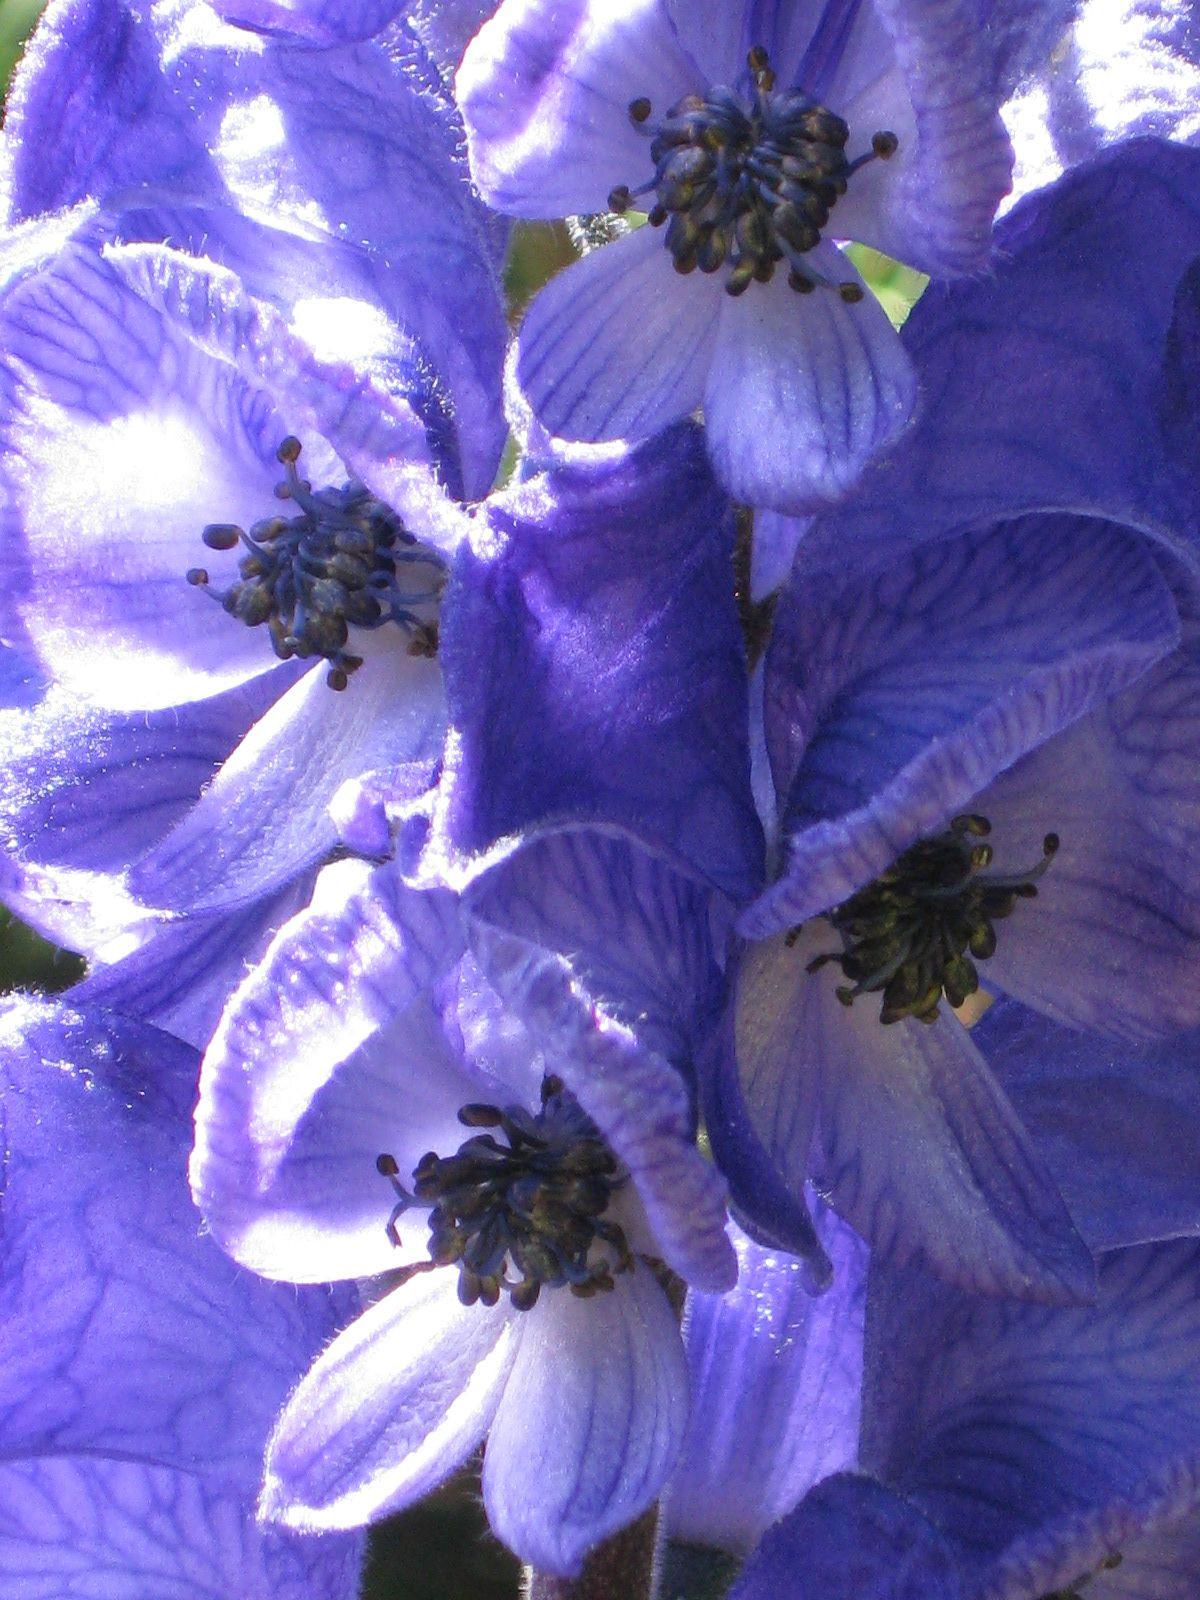 Ac²nit blau Aconitum napellus L subsp vulgare Rouy et Fouc Pic del Moro Font Romeu